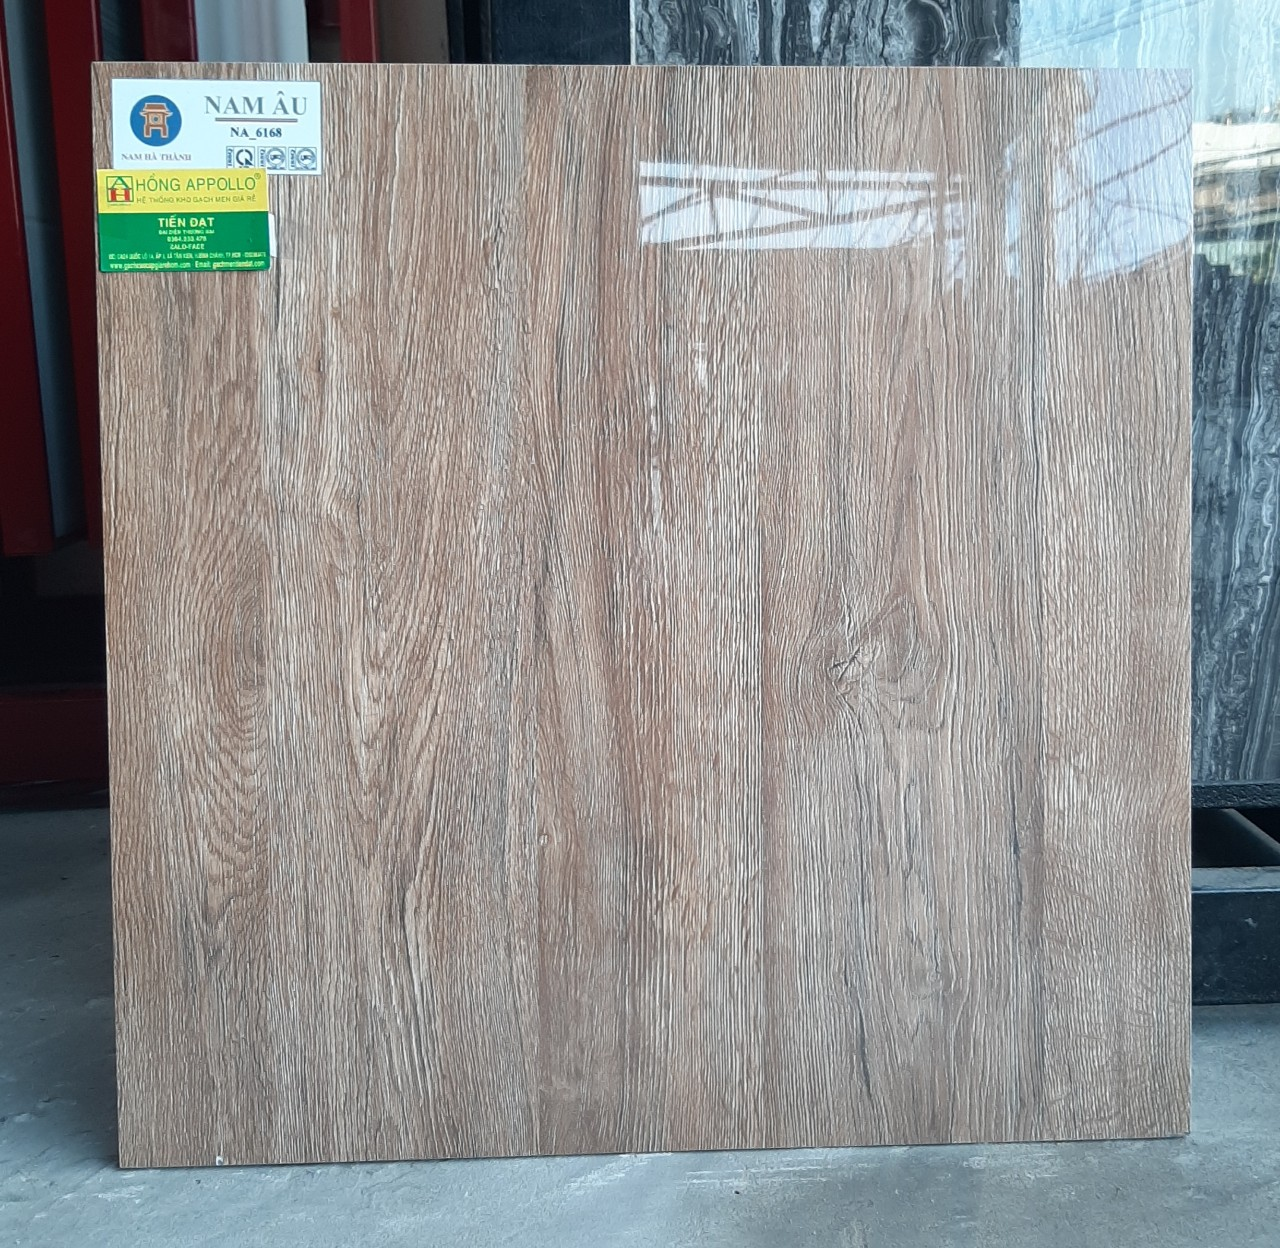 Gạch giả gỗ 60x60 cao cấp